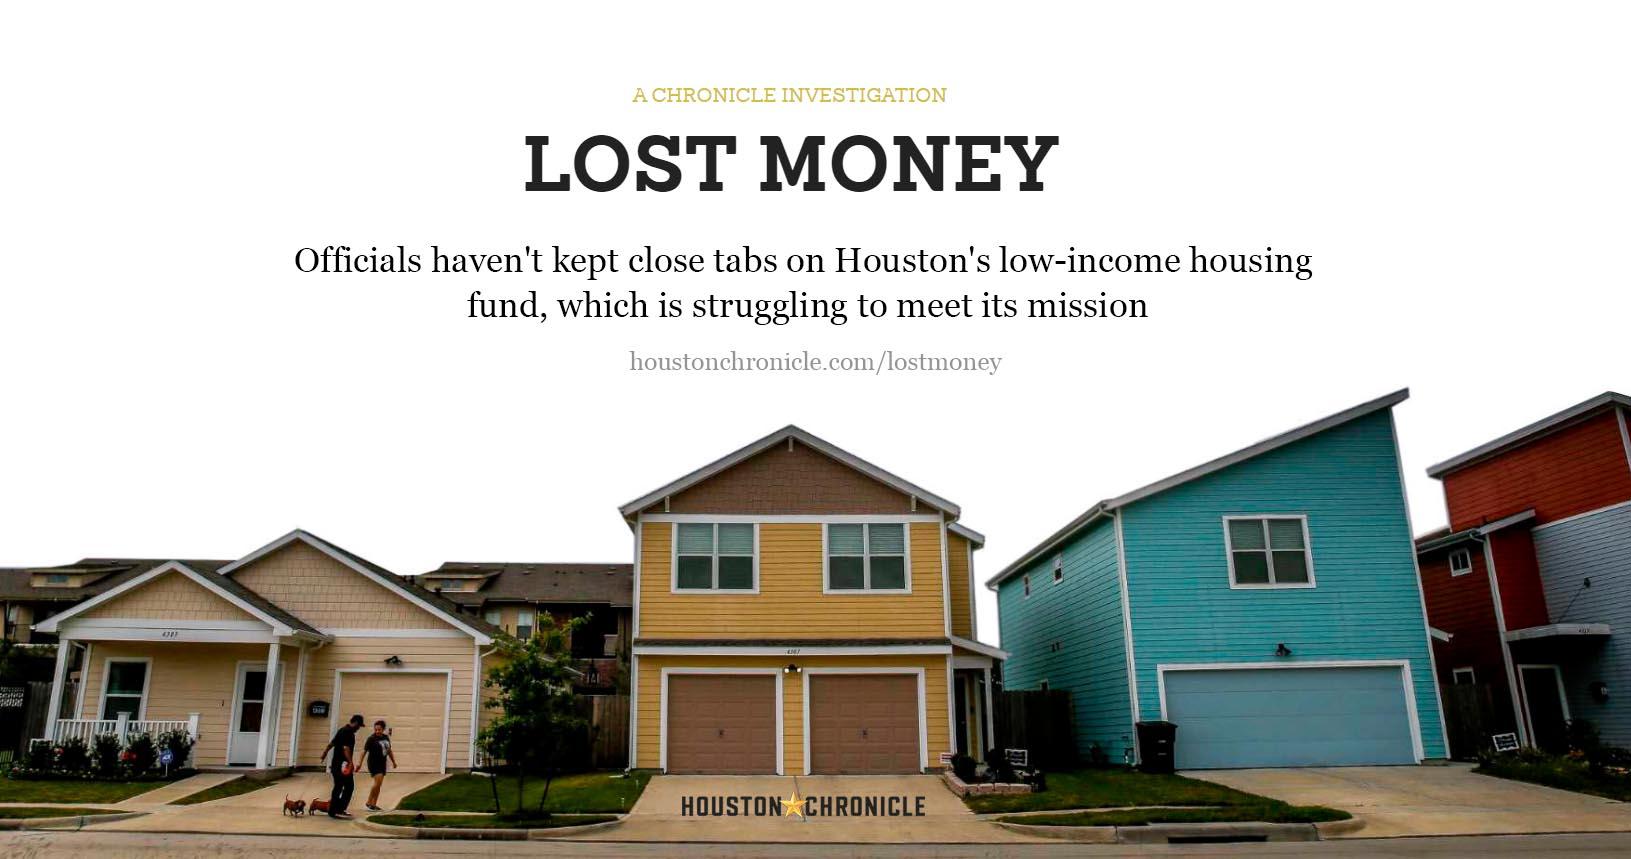 lost money - houston chronicle